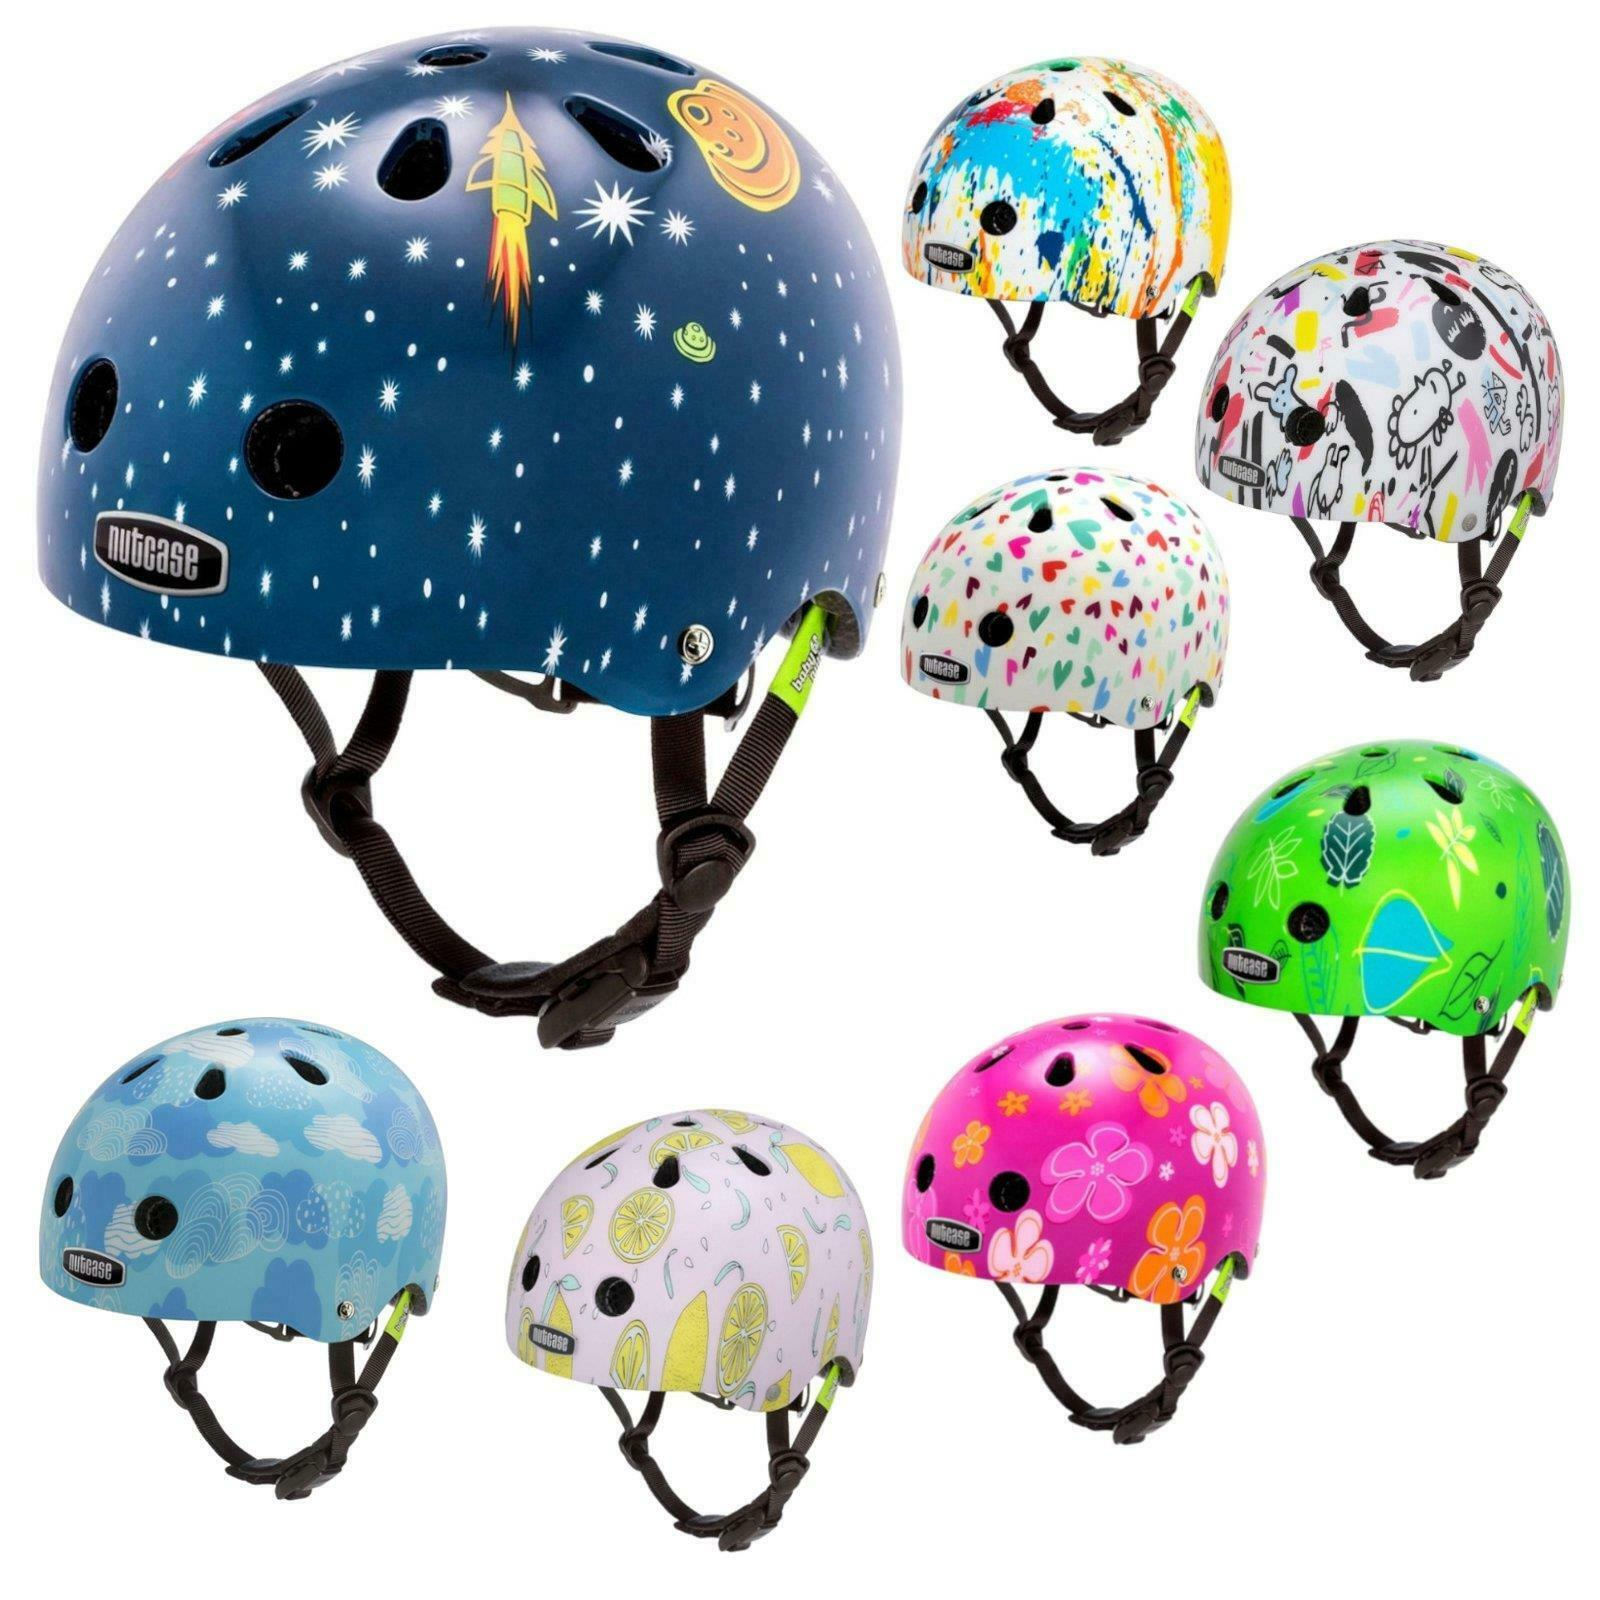 Nutcase Baby Nutty Fahrrad Street Helmet Toddlers Adjustable Impeller XXS 47-50cm